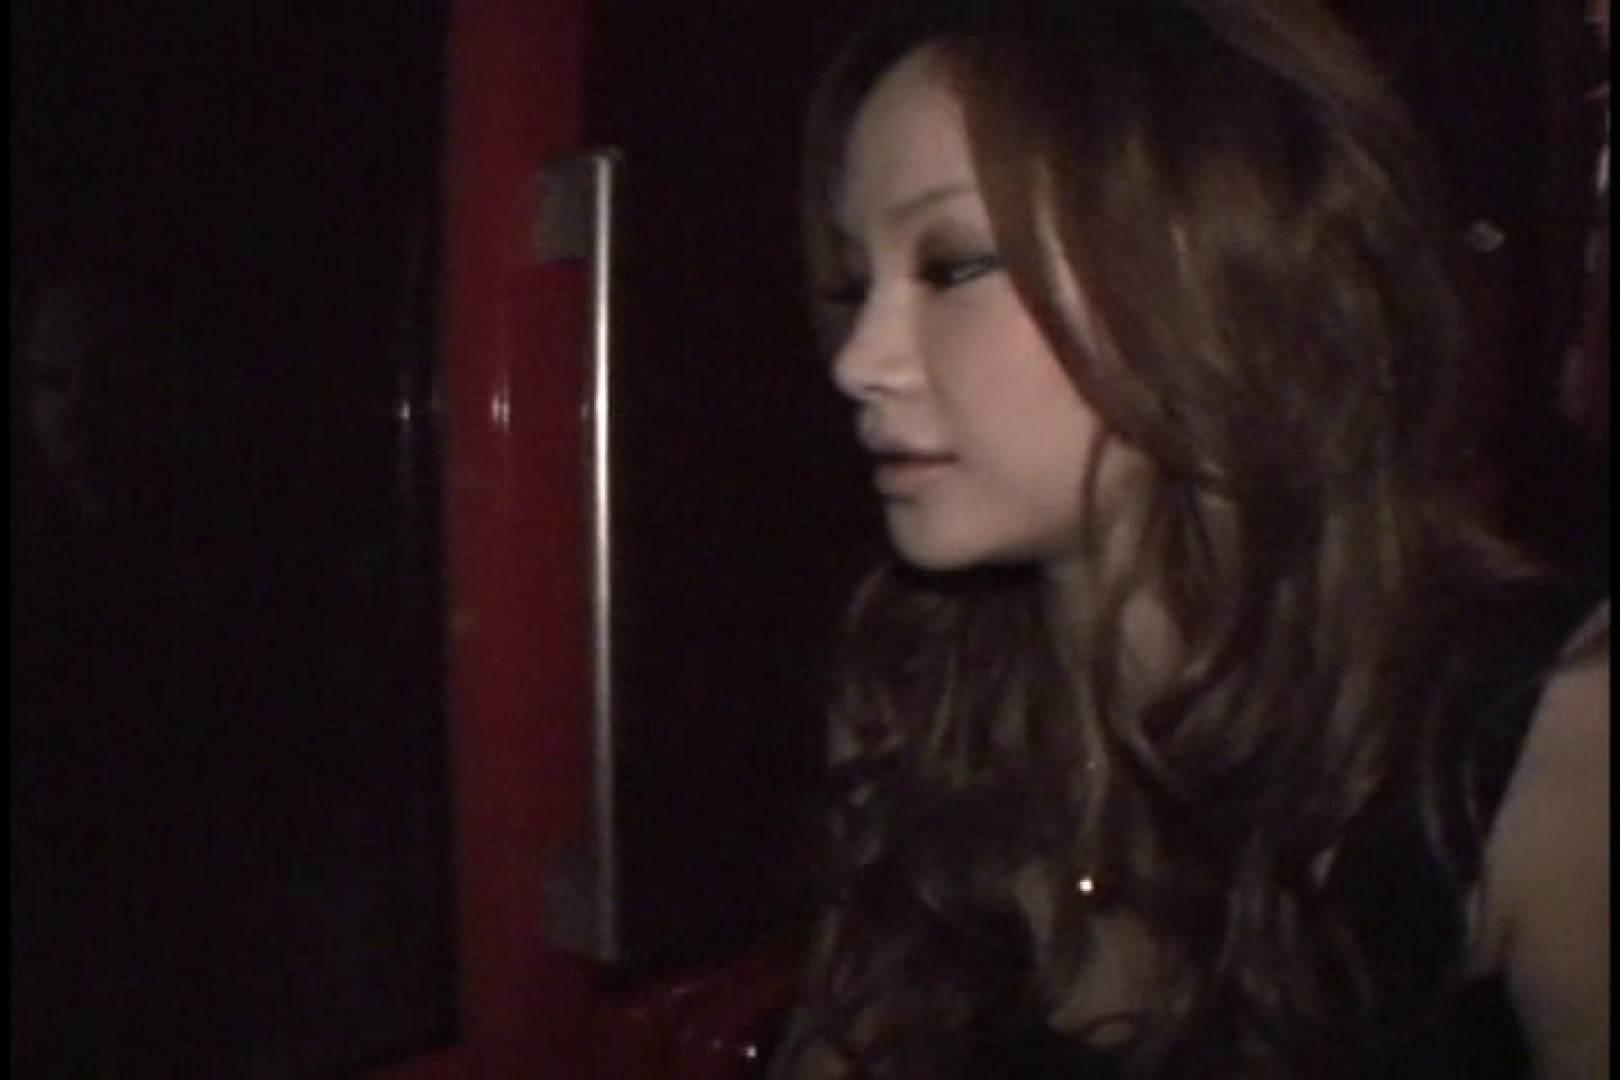 JDハンター全国ツアー vol.024 後編 女子大生のエロ動画 | 0  75PIX 1